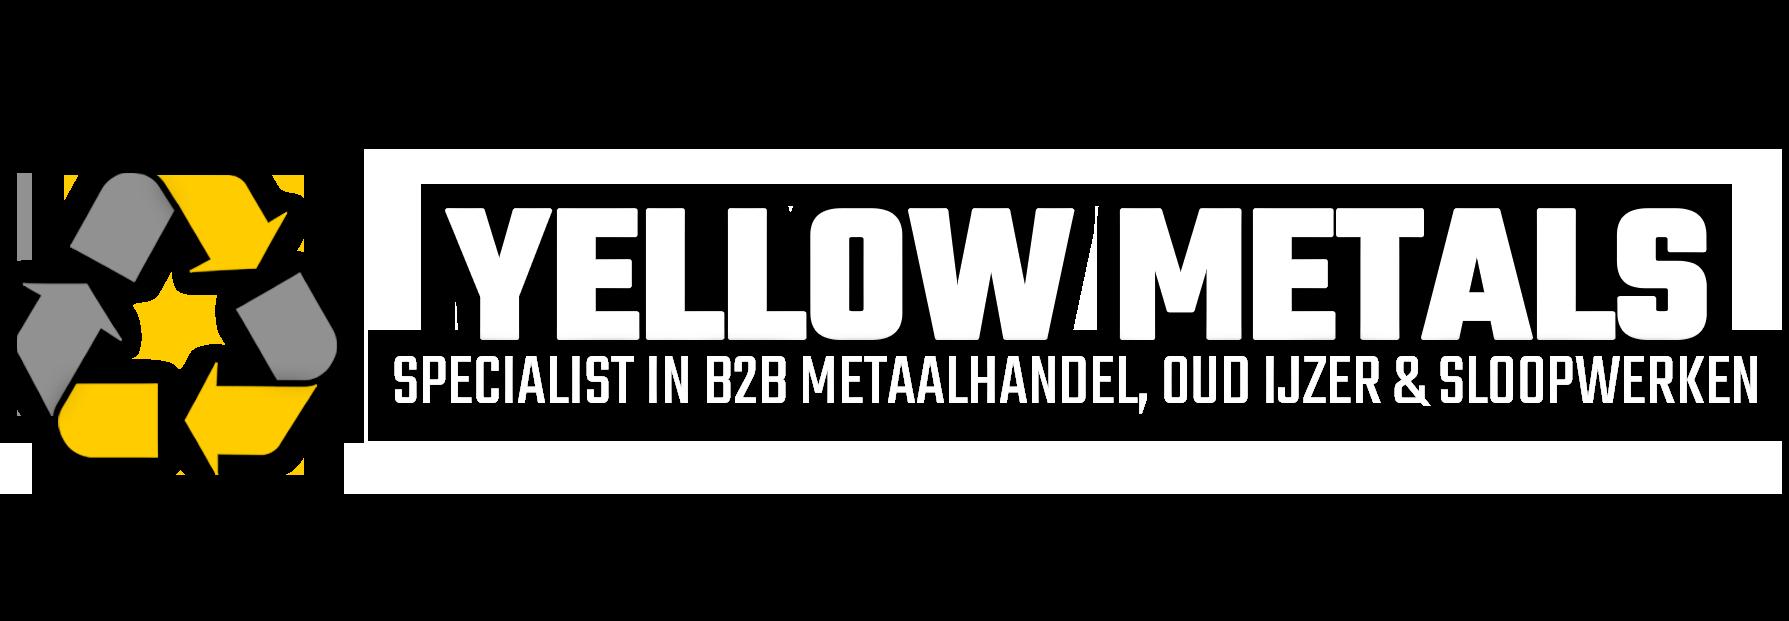 Ophalen oud ijzer Amsterdam? ✅  | Yellow Metals